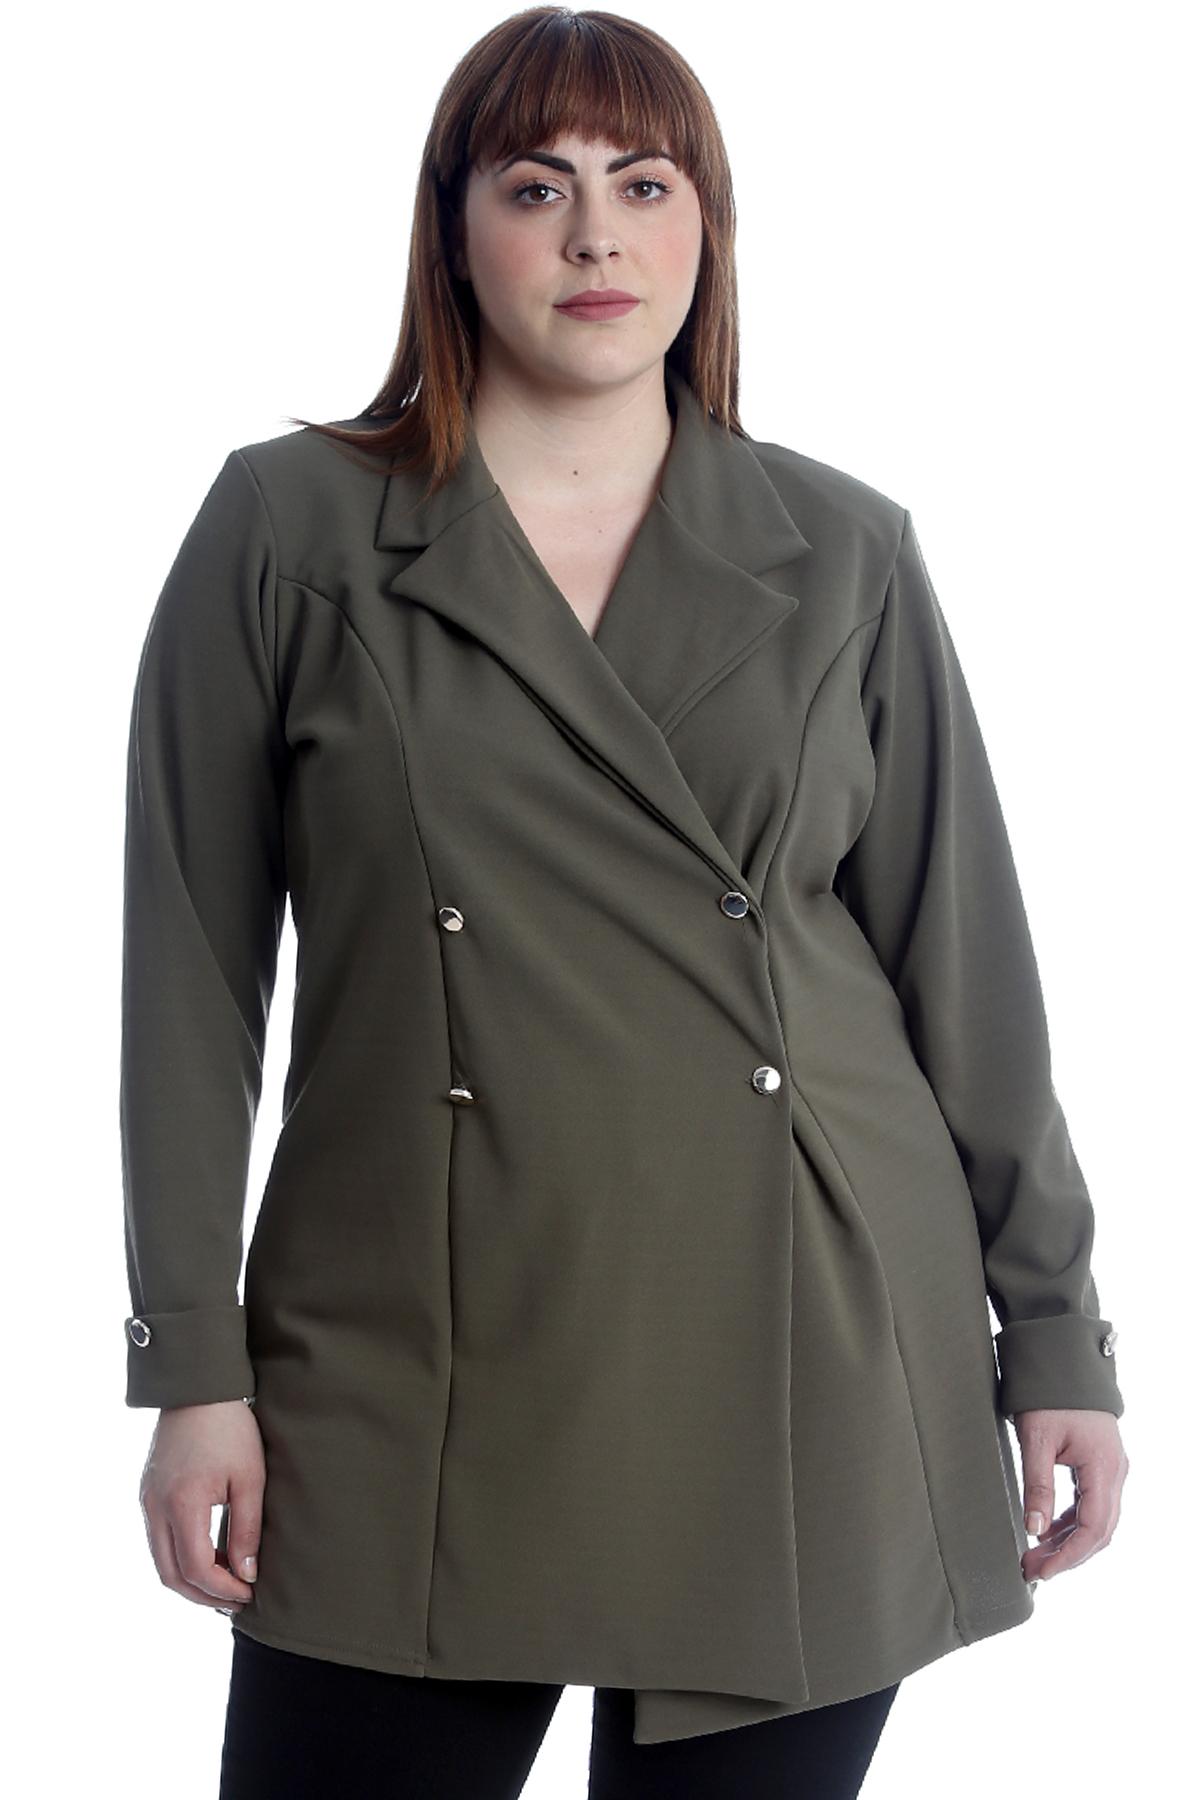 New Womens Plus Size Coat Ladies Blazer Jacket Formal ...